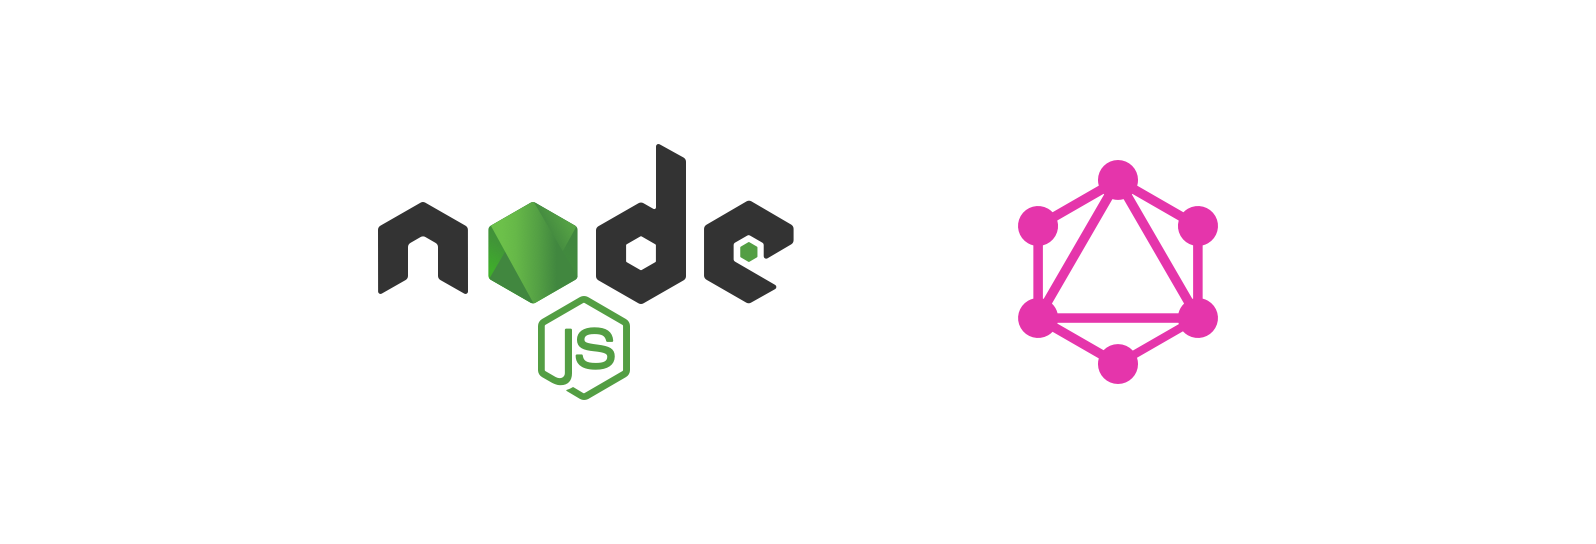 A Simple CRUD App Using GraphQL, NodeJS, and MongoDB